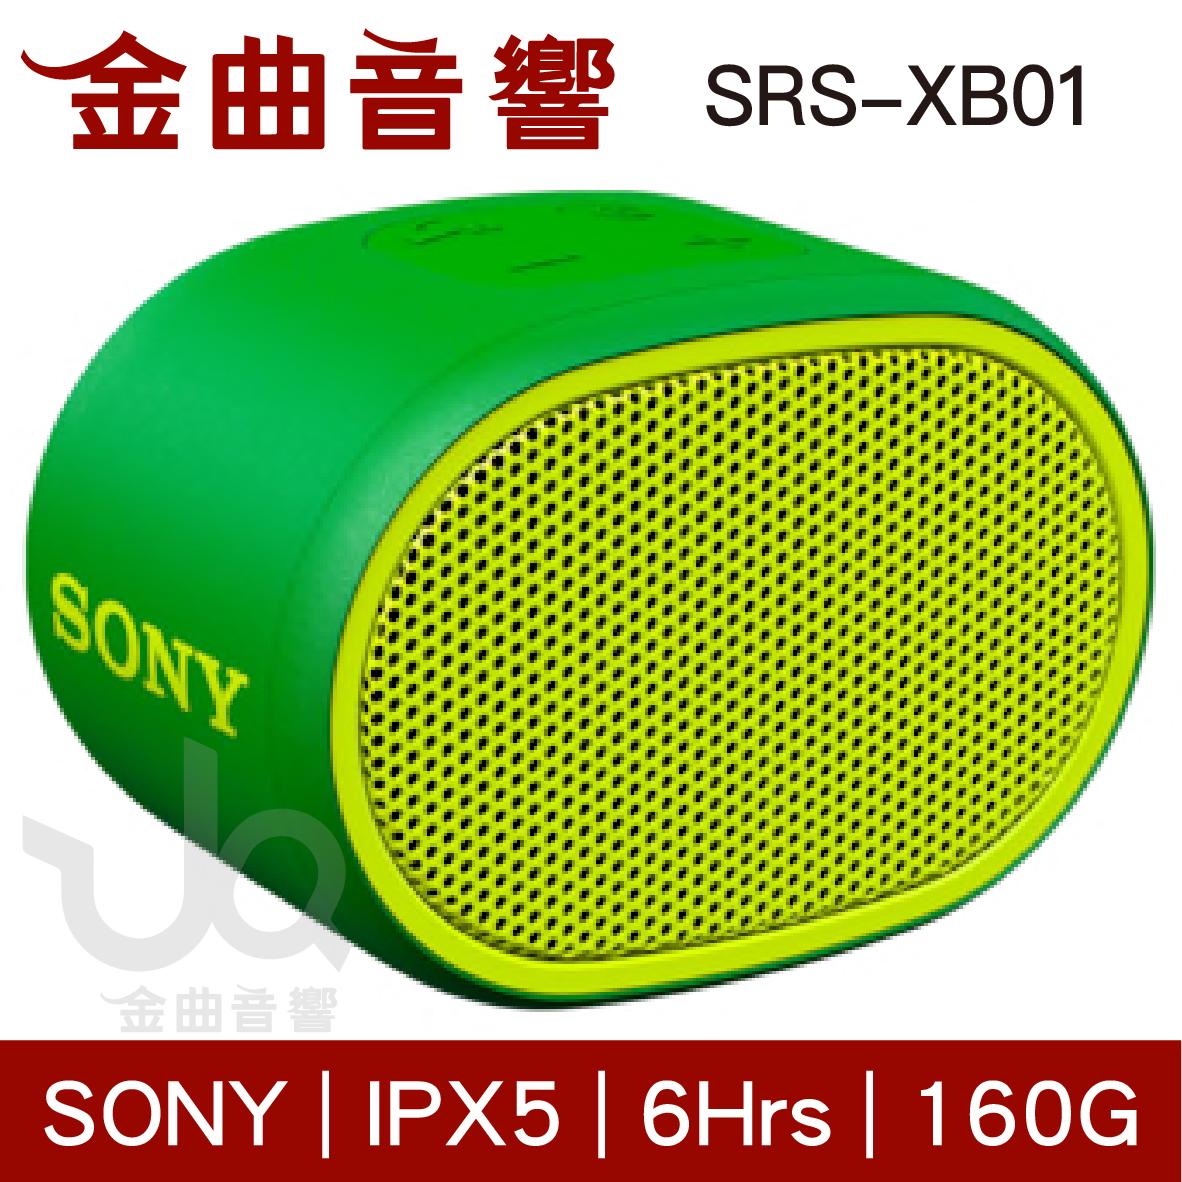 SONY 可攜行藍牙喇叭 SRS-XB01 綠 ( 防潑水 可攜行 重低音 藍牙 喇叭 XB01) | 金曲音響